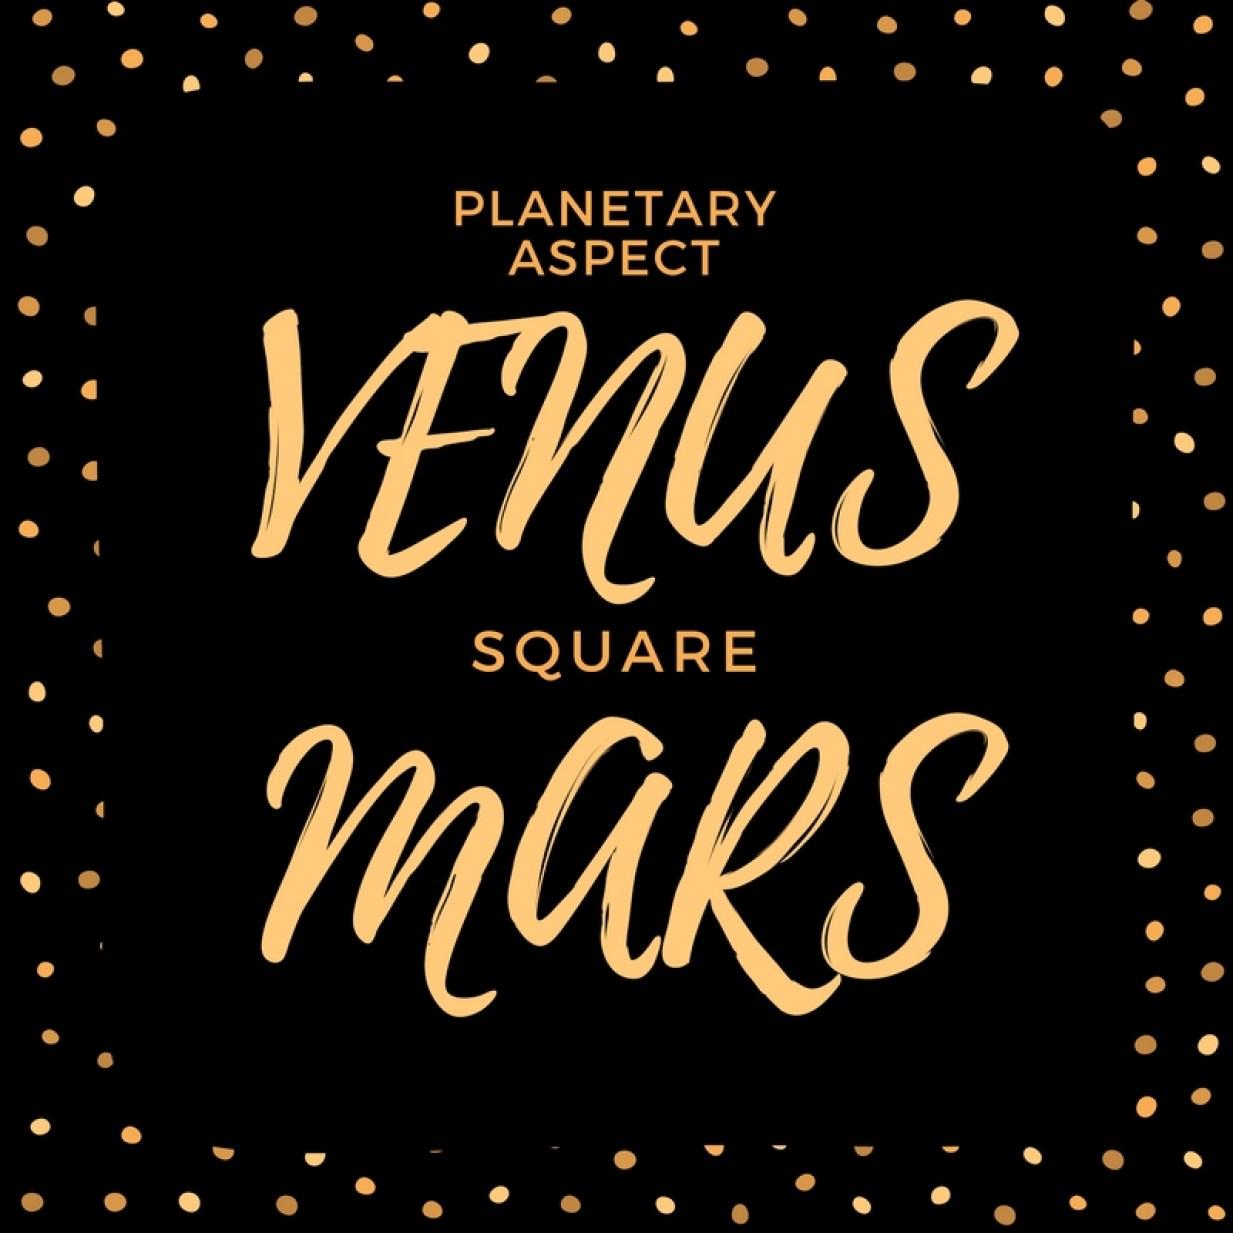 Venera kvadrat Mars *tranzit